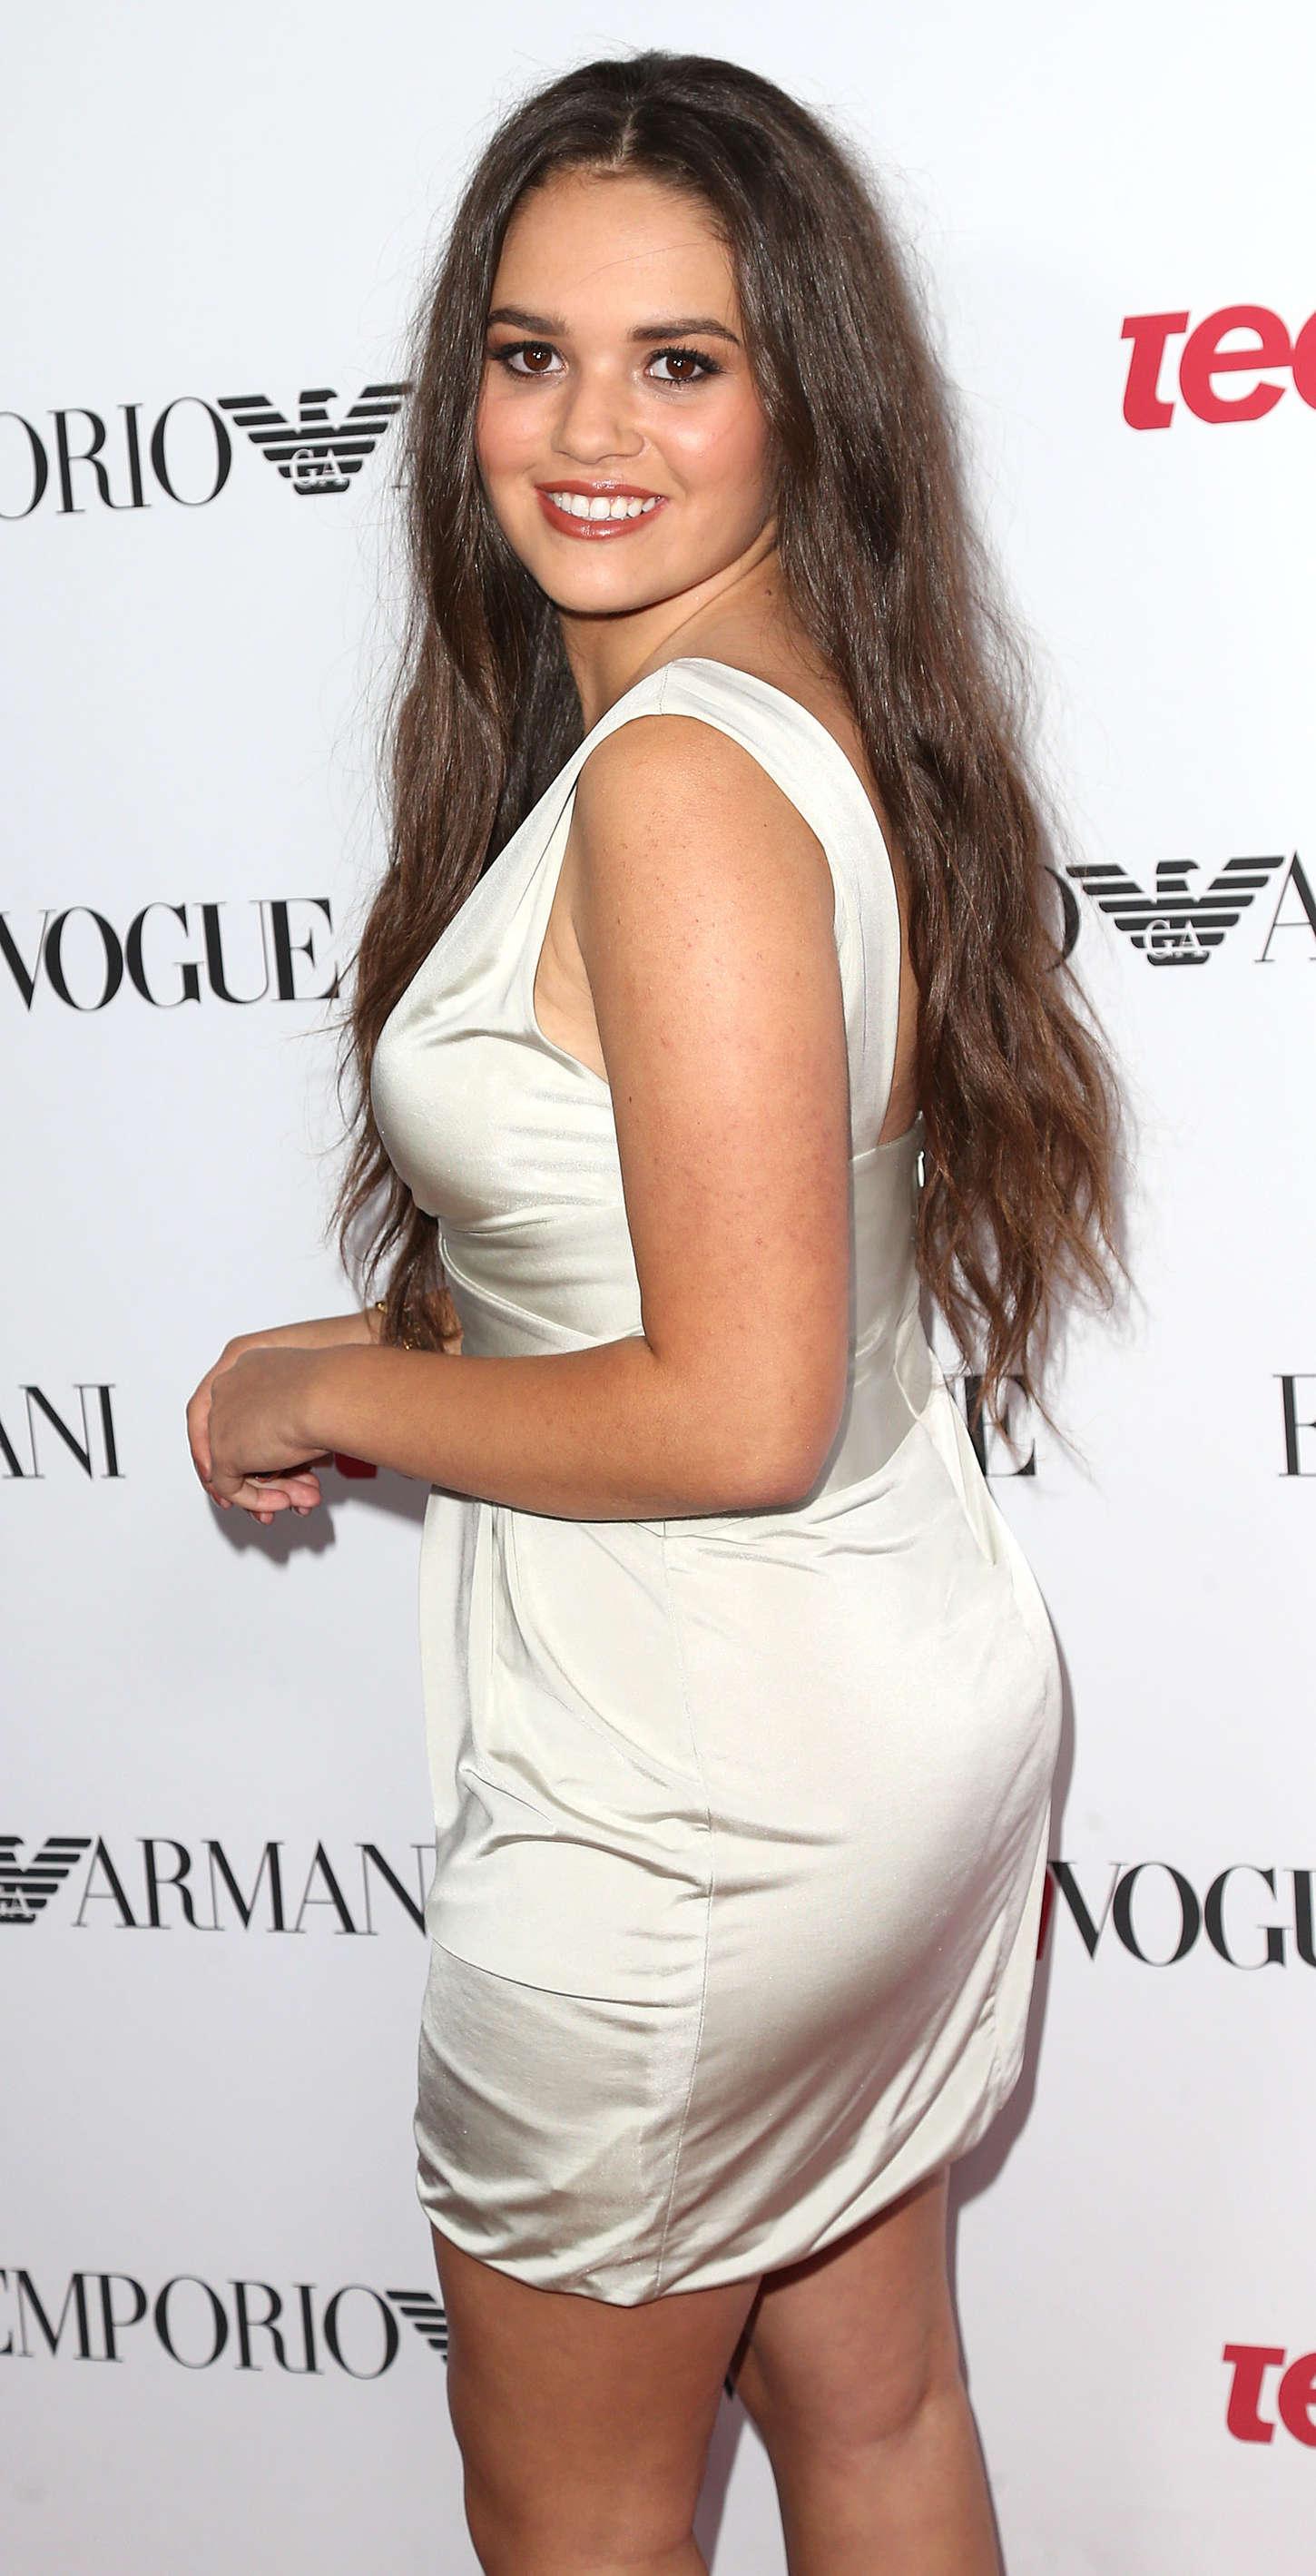 Hot Madison Pettis nudes (78 photo), Pussy, Bikini, Instagram, braless 2019